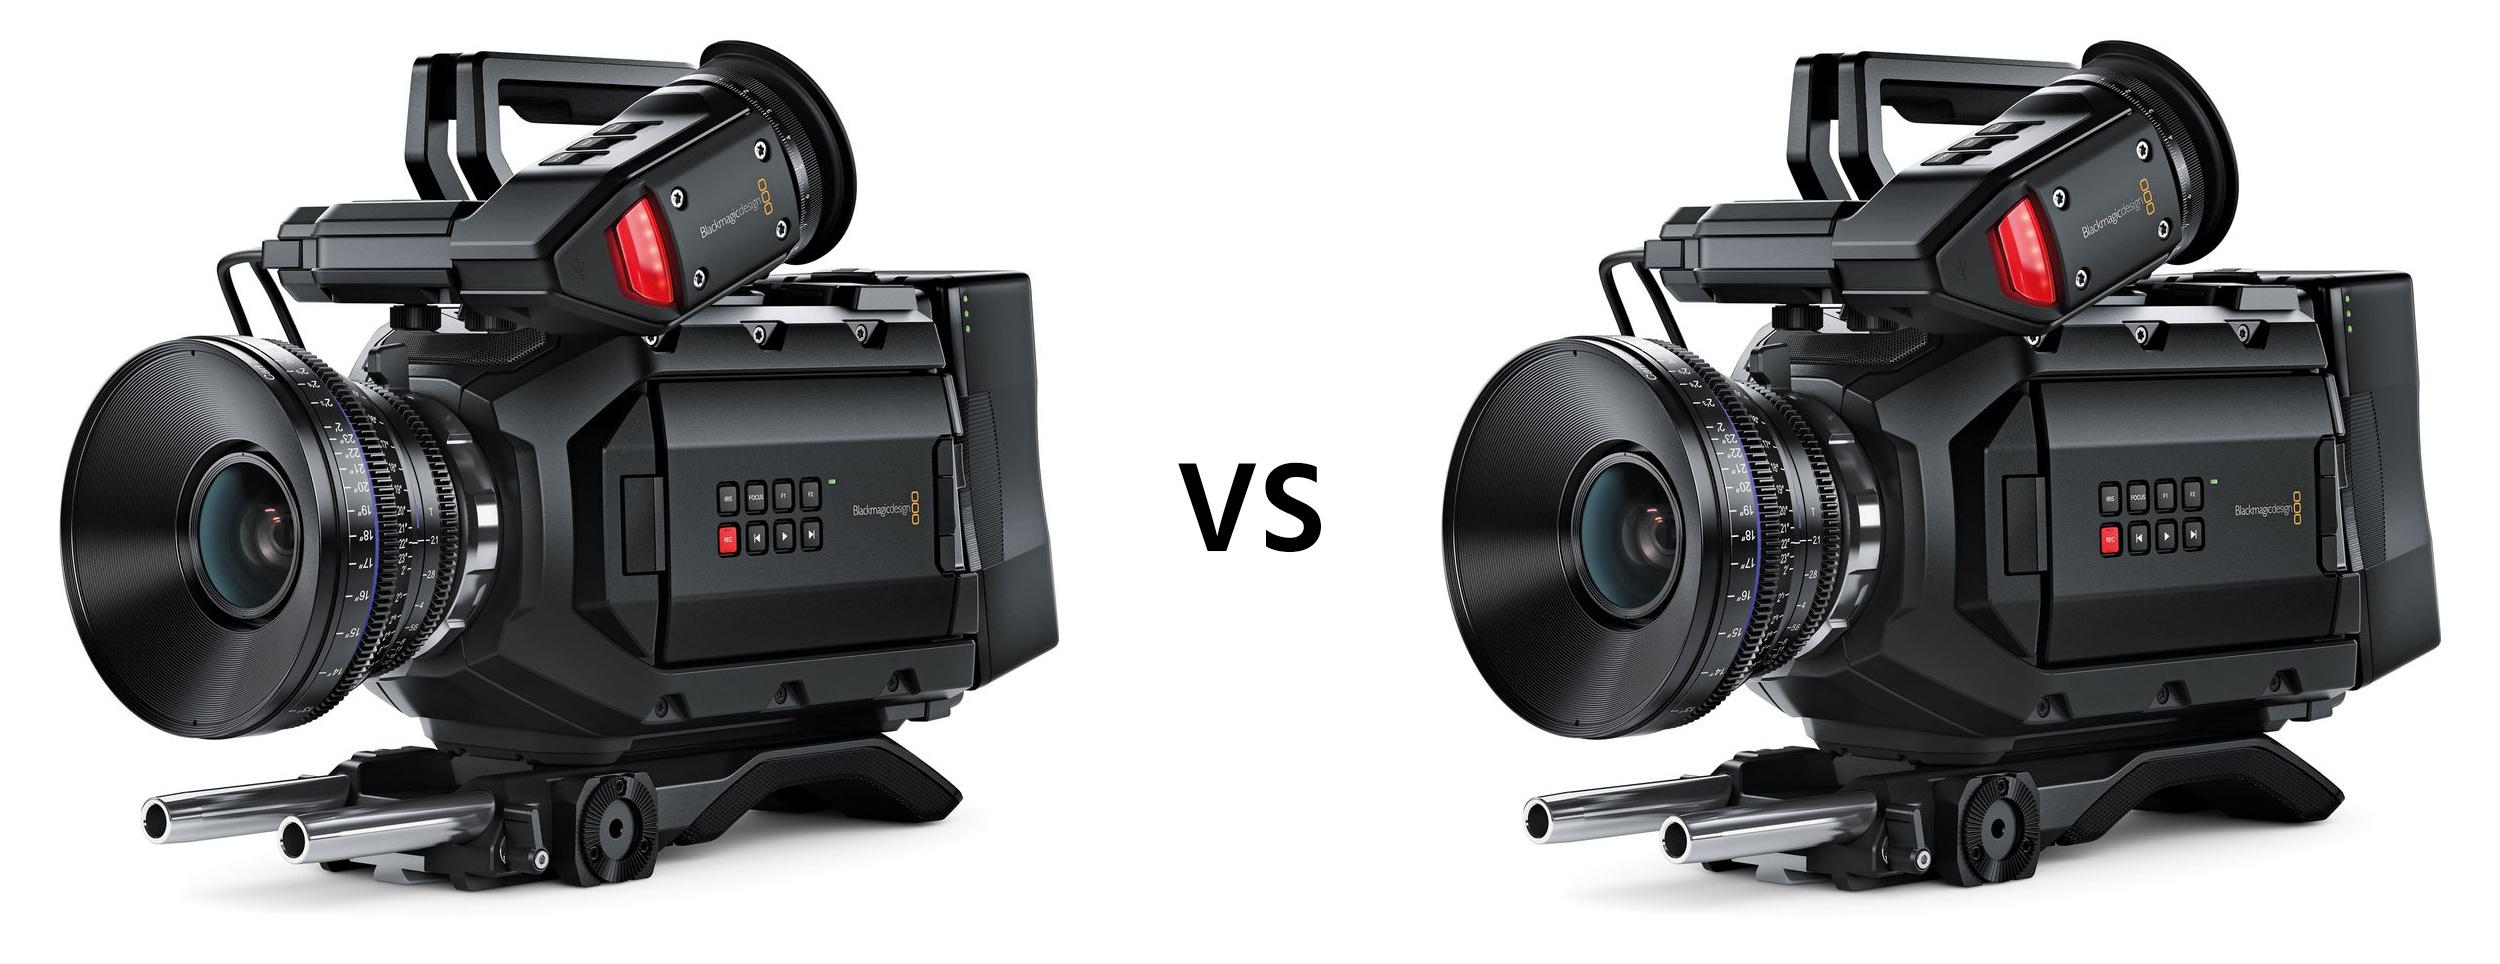 Blackmagic URSA Mini 4K vs 4.6K - How Good is the 4.6K? | cinema5D